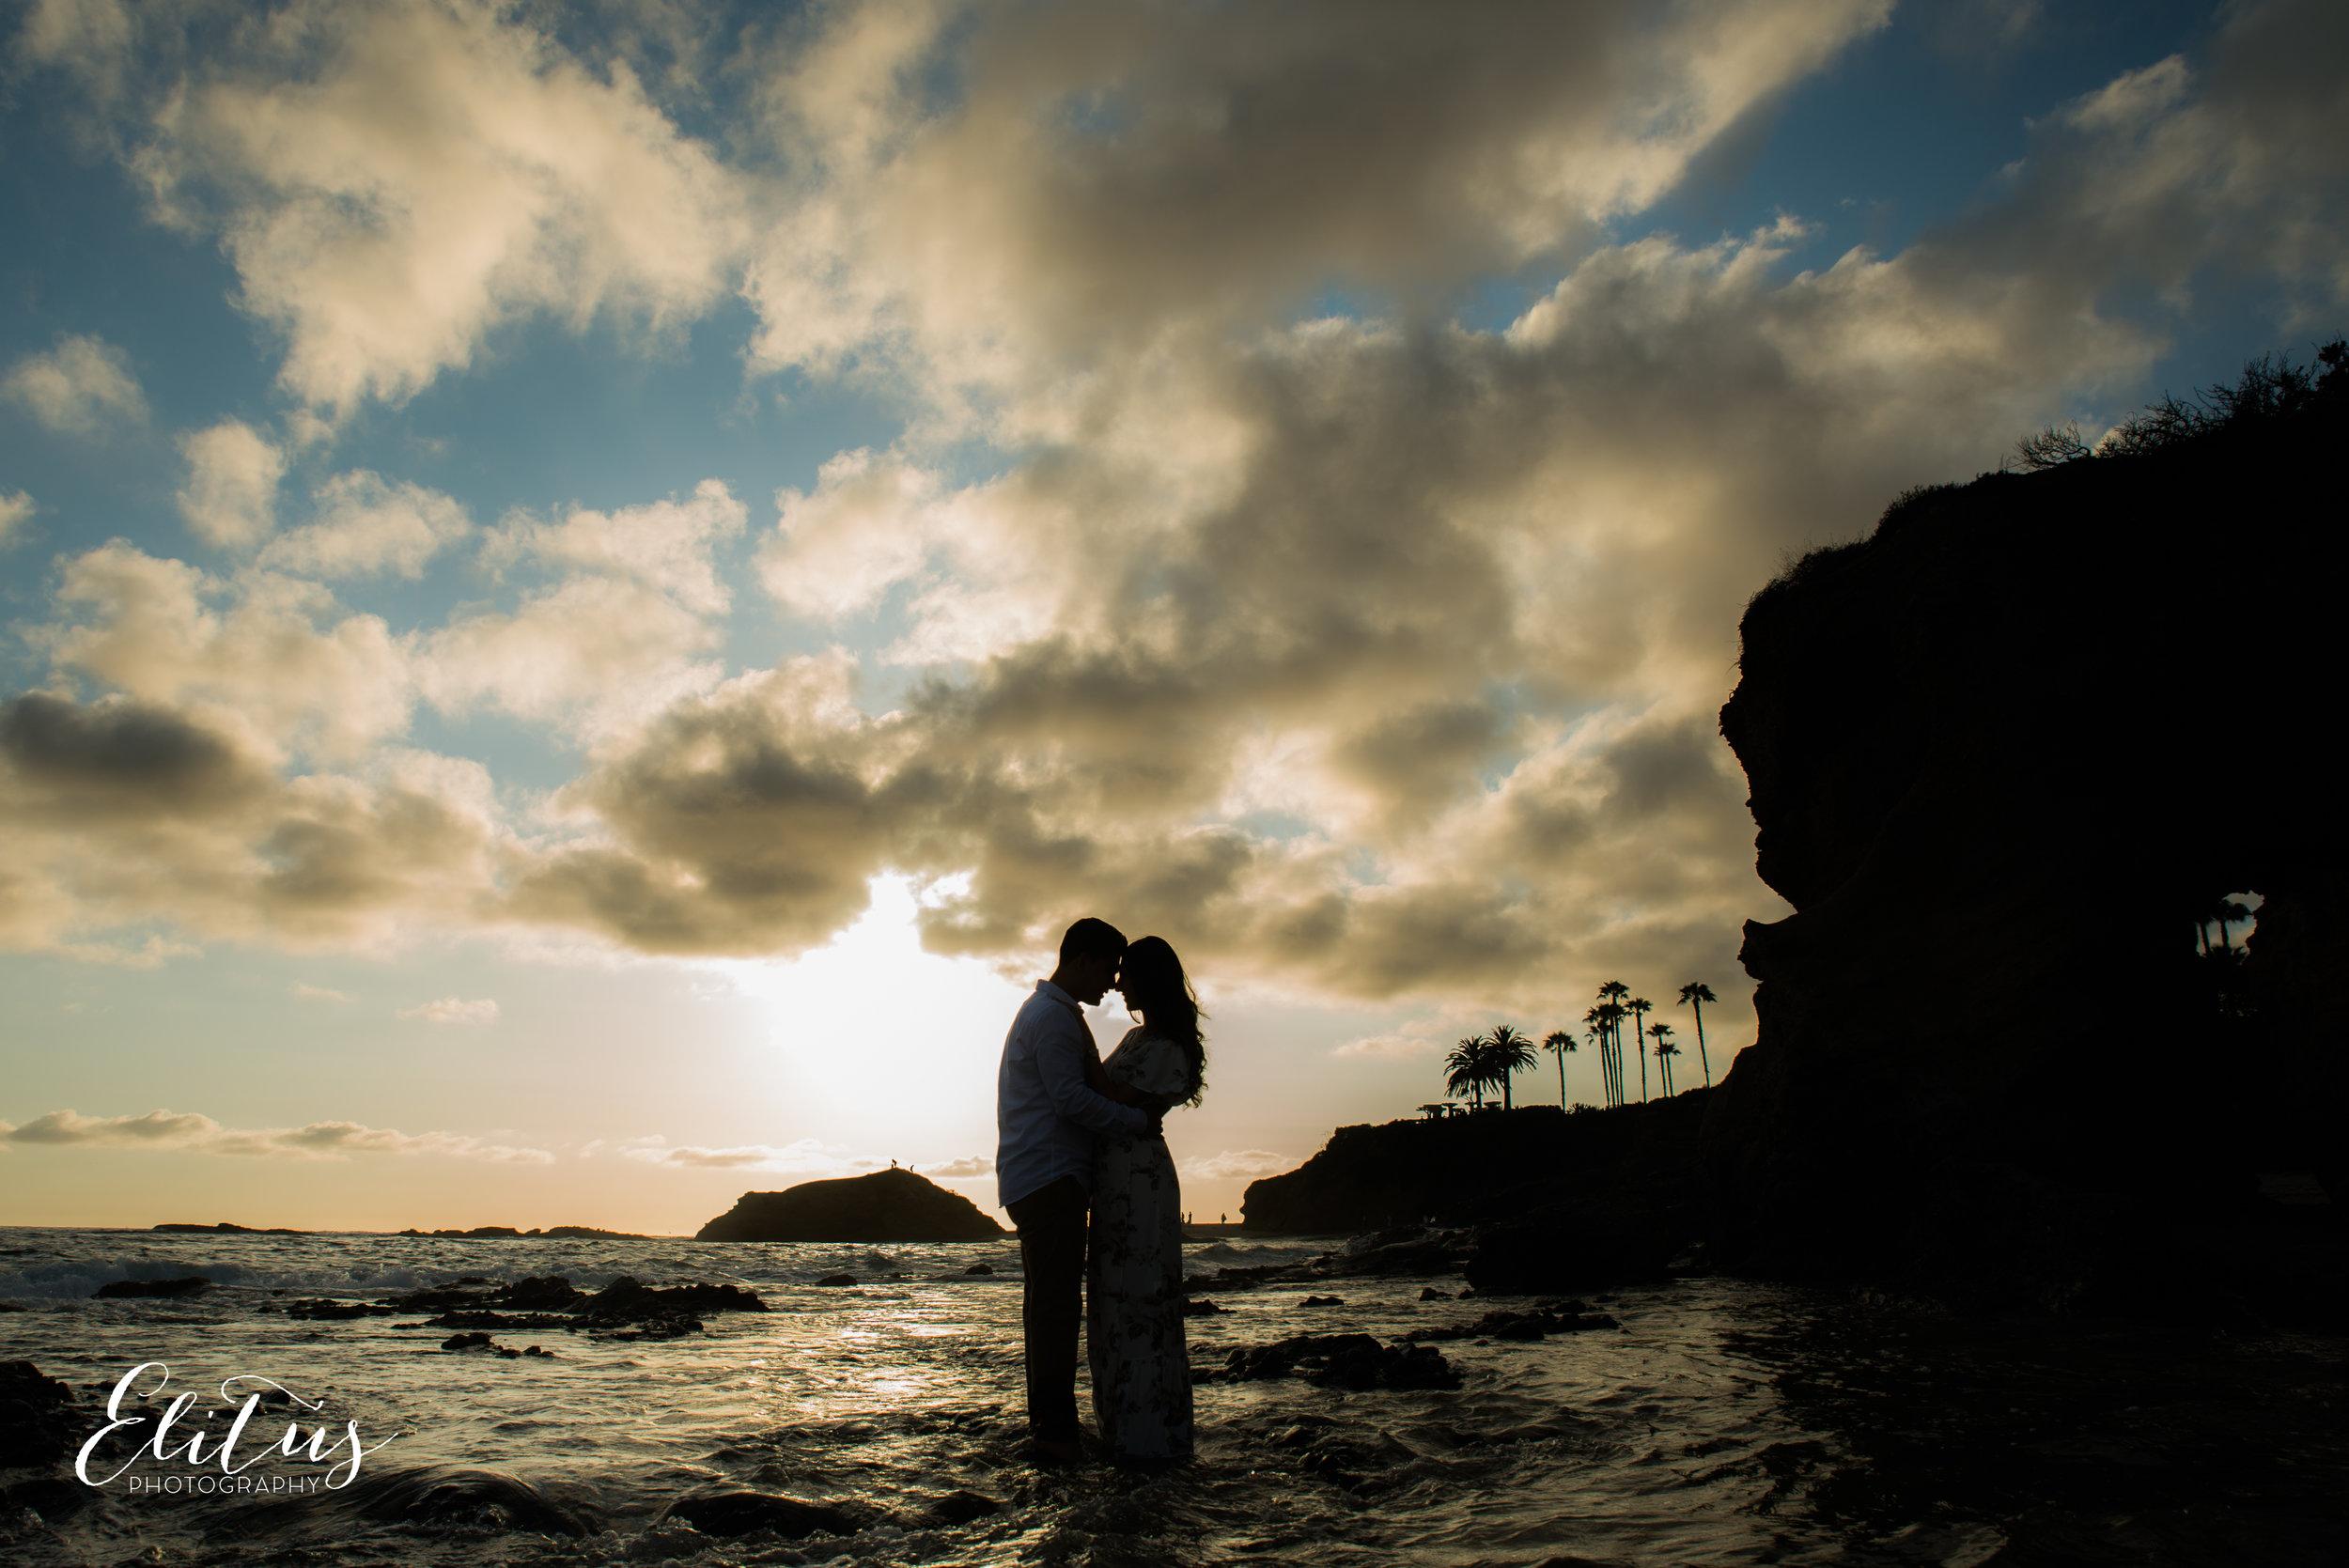 elitus-photograpy-laguna-beach-marisol-benito-engagement (105 of 115).jpg